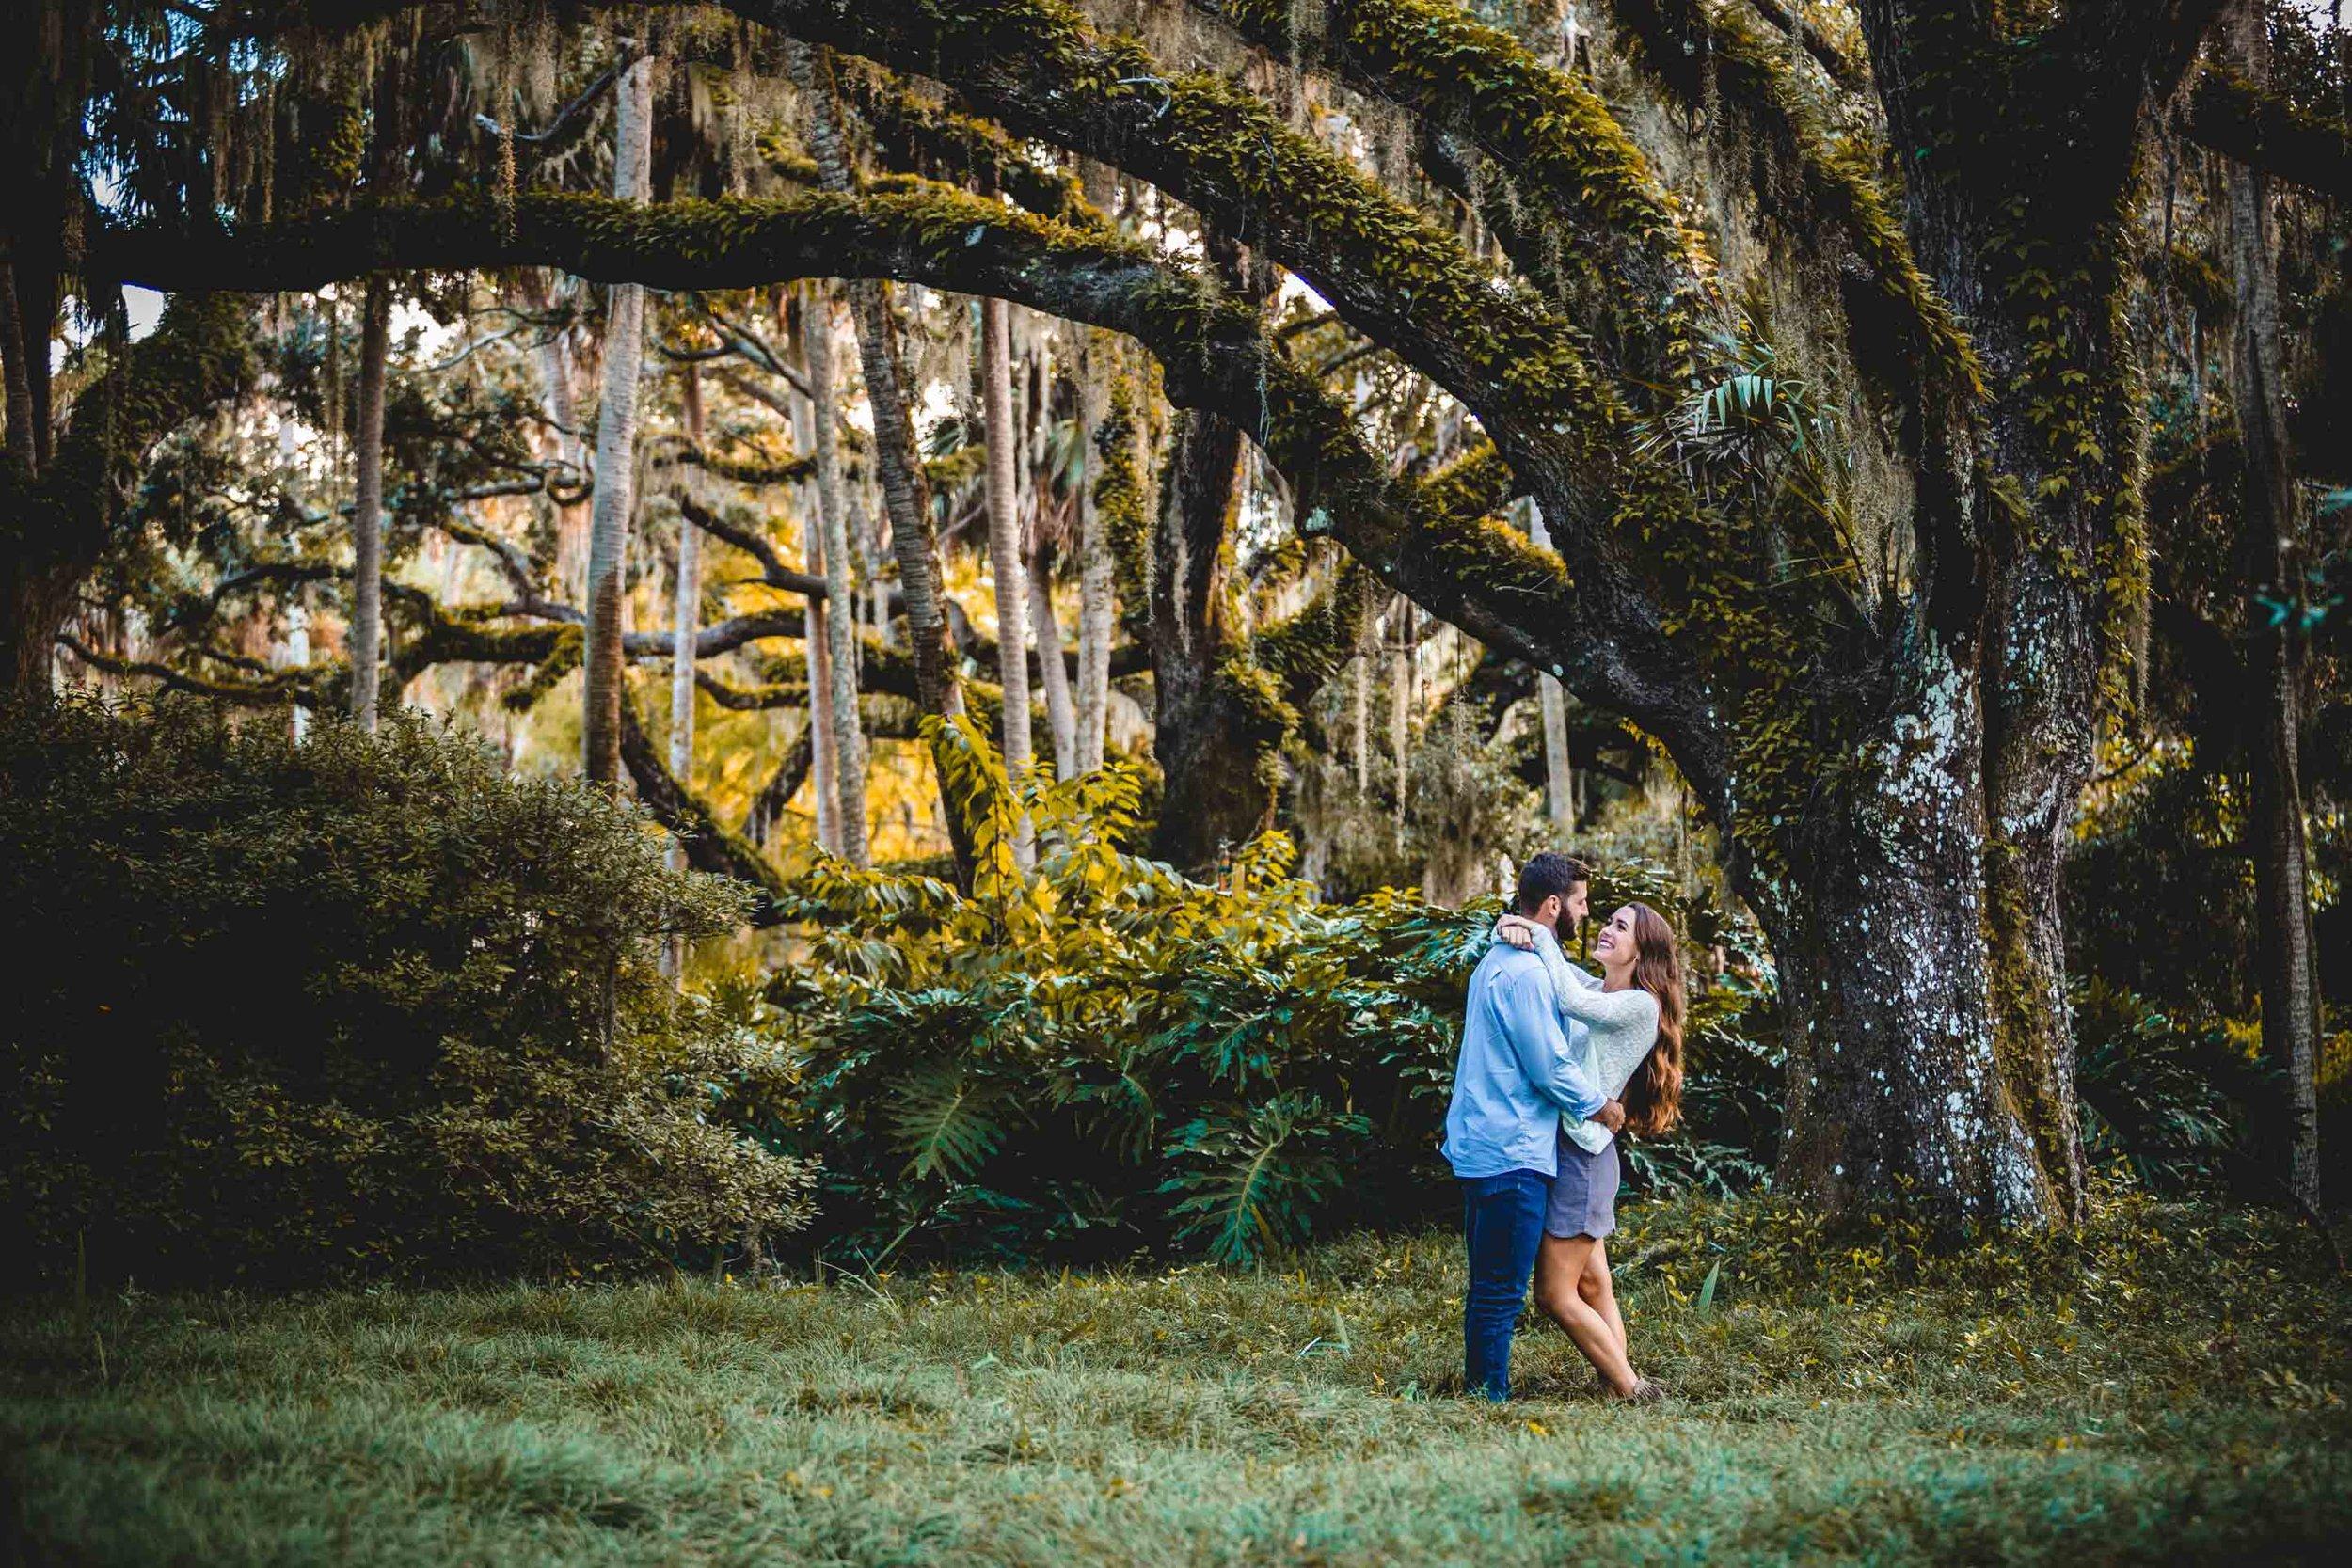 adam-szarmack-jacksonville-wedding-photographer-palm-coast-washing-oaks-garden-state-park-engagement-38.jpg